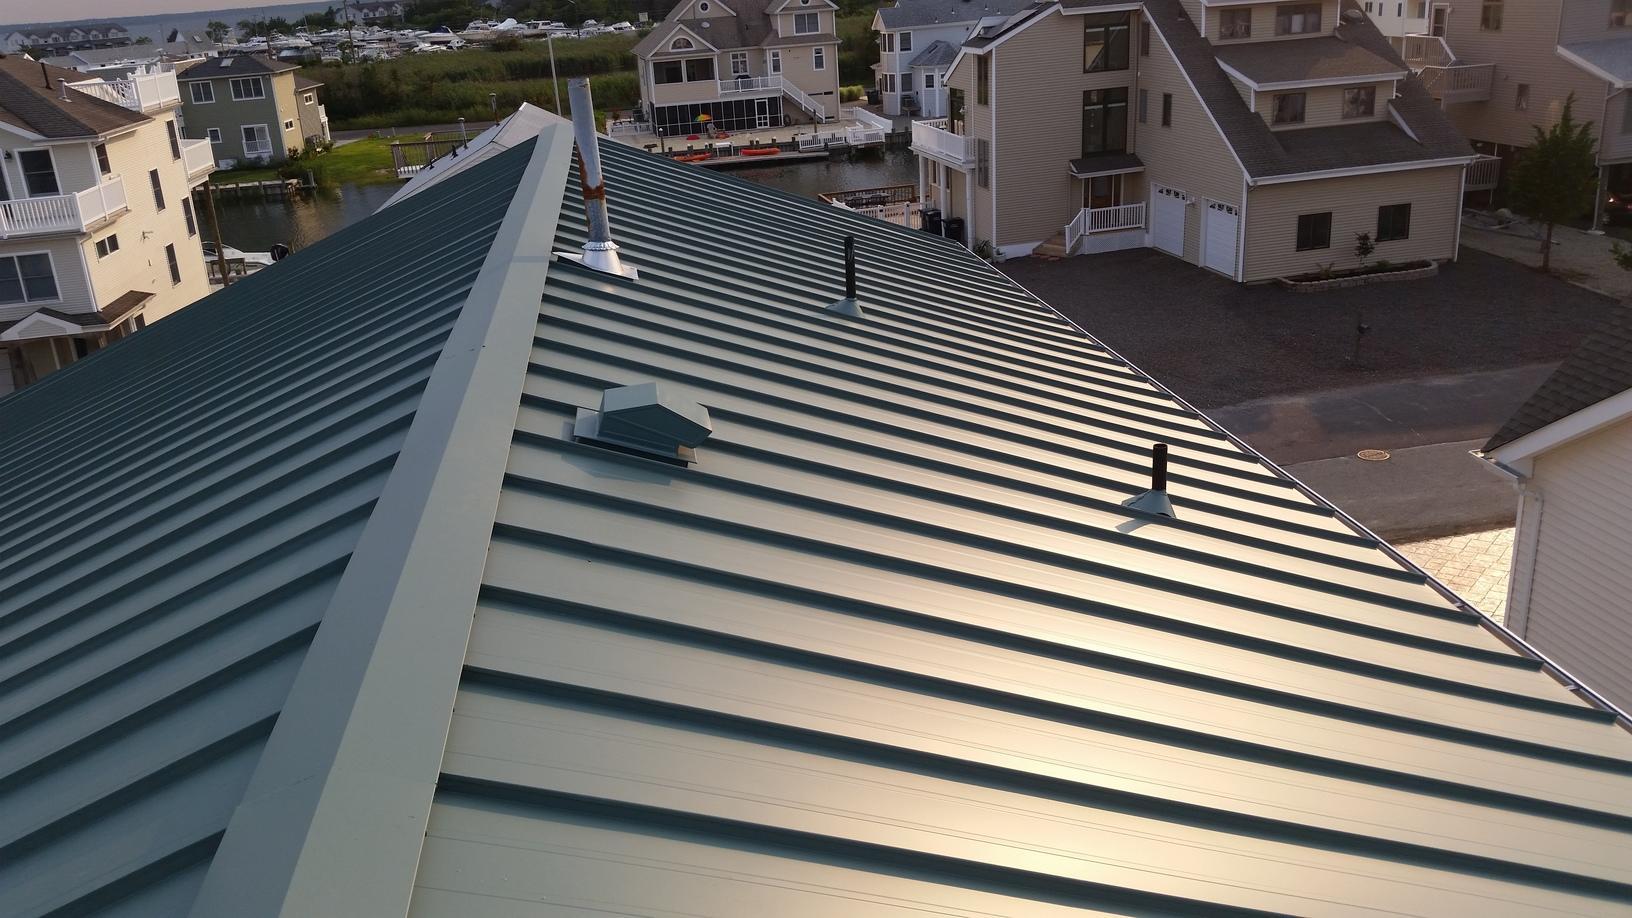 Hemlock Drexel G-Tech Standing Seam Metal Roof Install on Jersey Shore Home